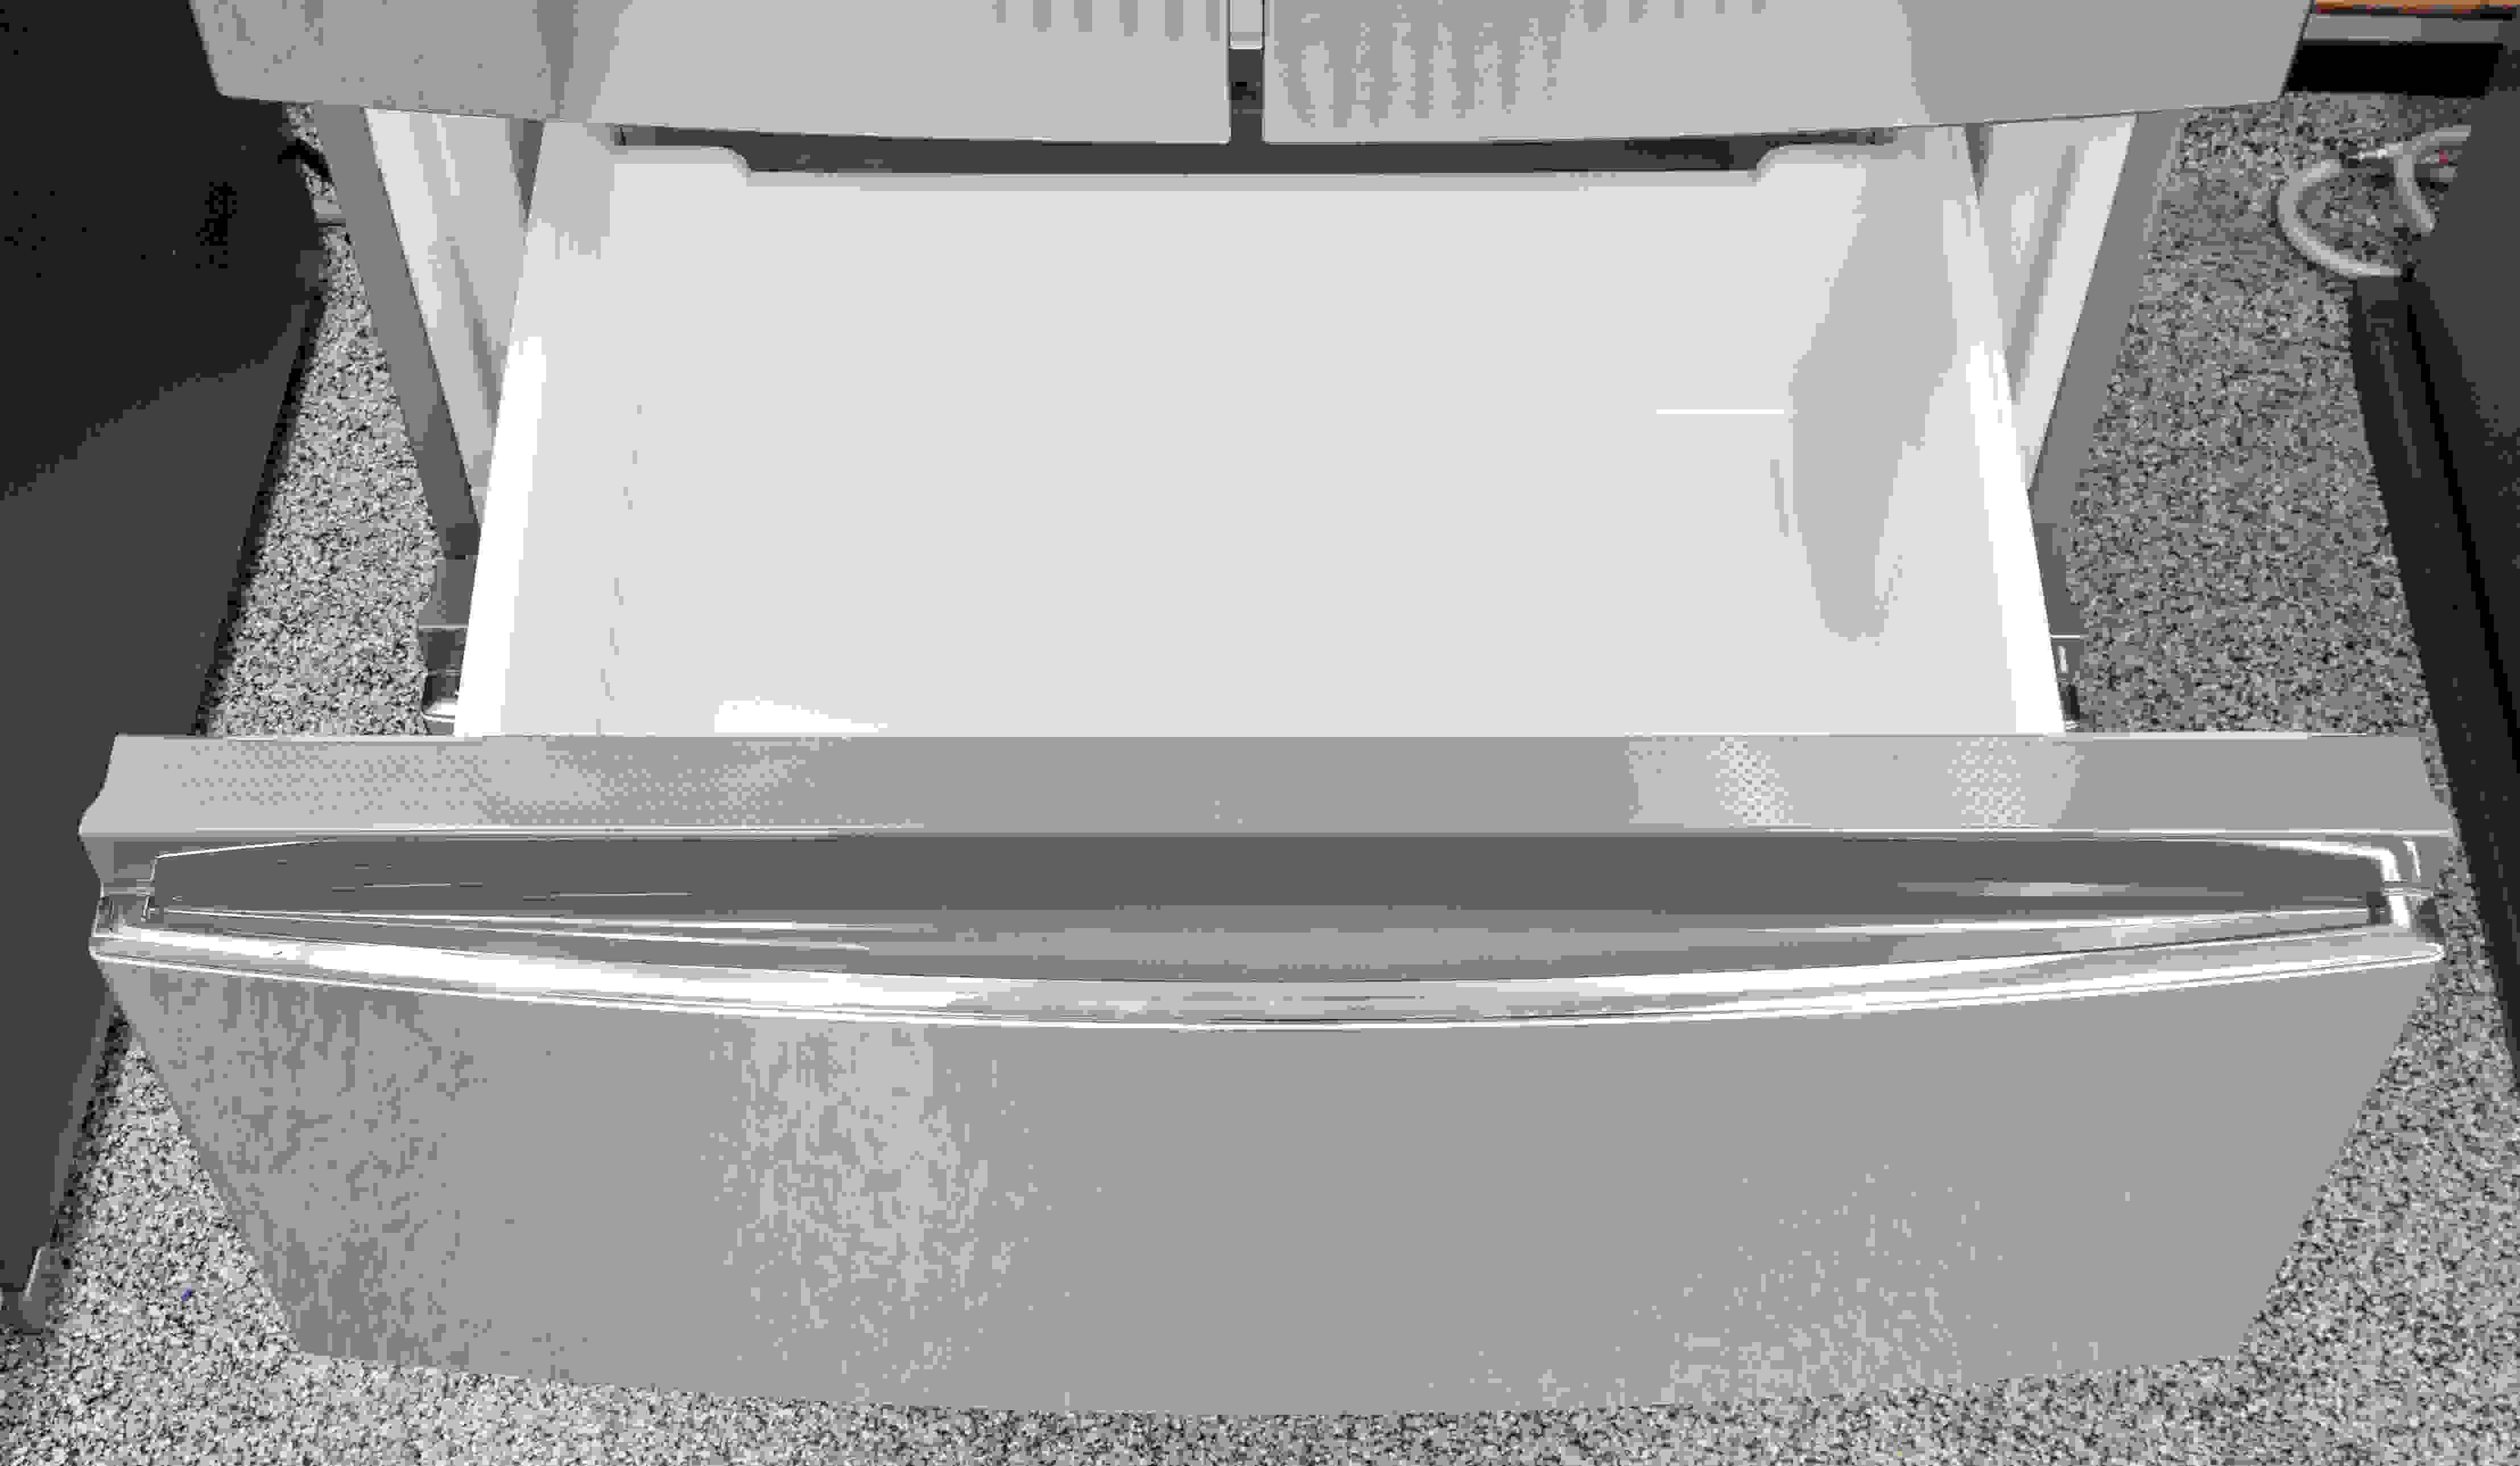 The Haier HRF15N3AGS's upper freezer bin is basically a large sliding bucket.